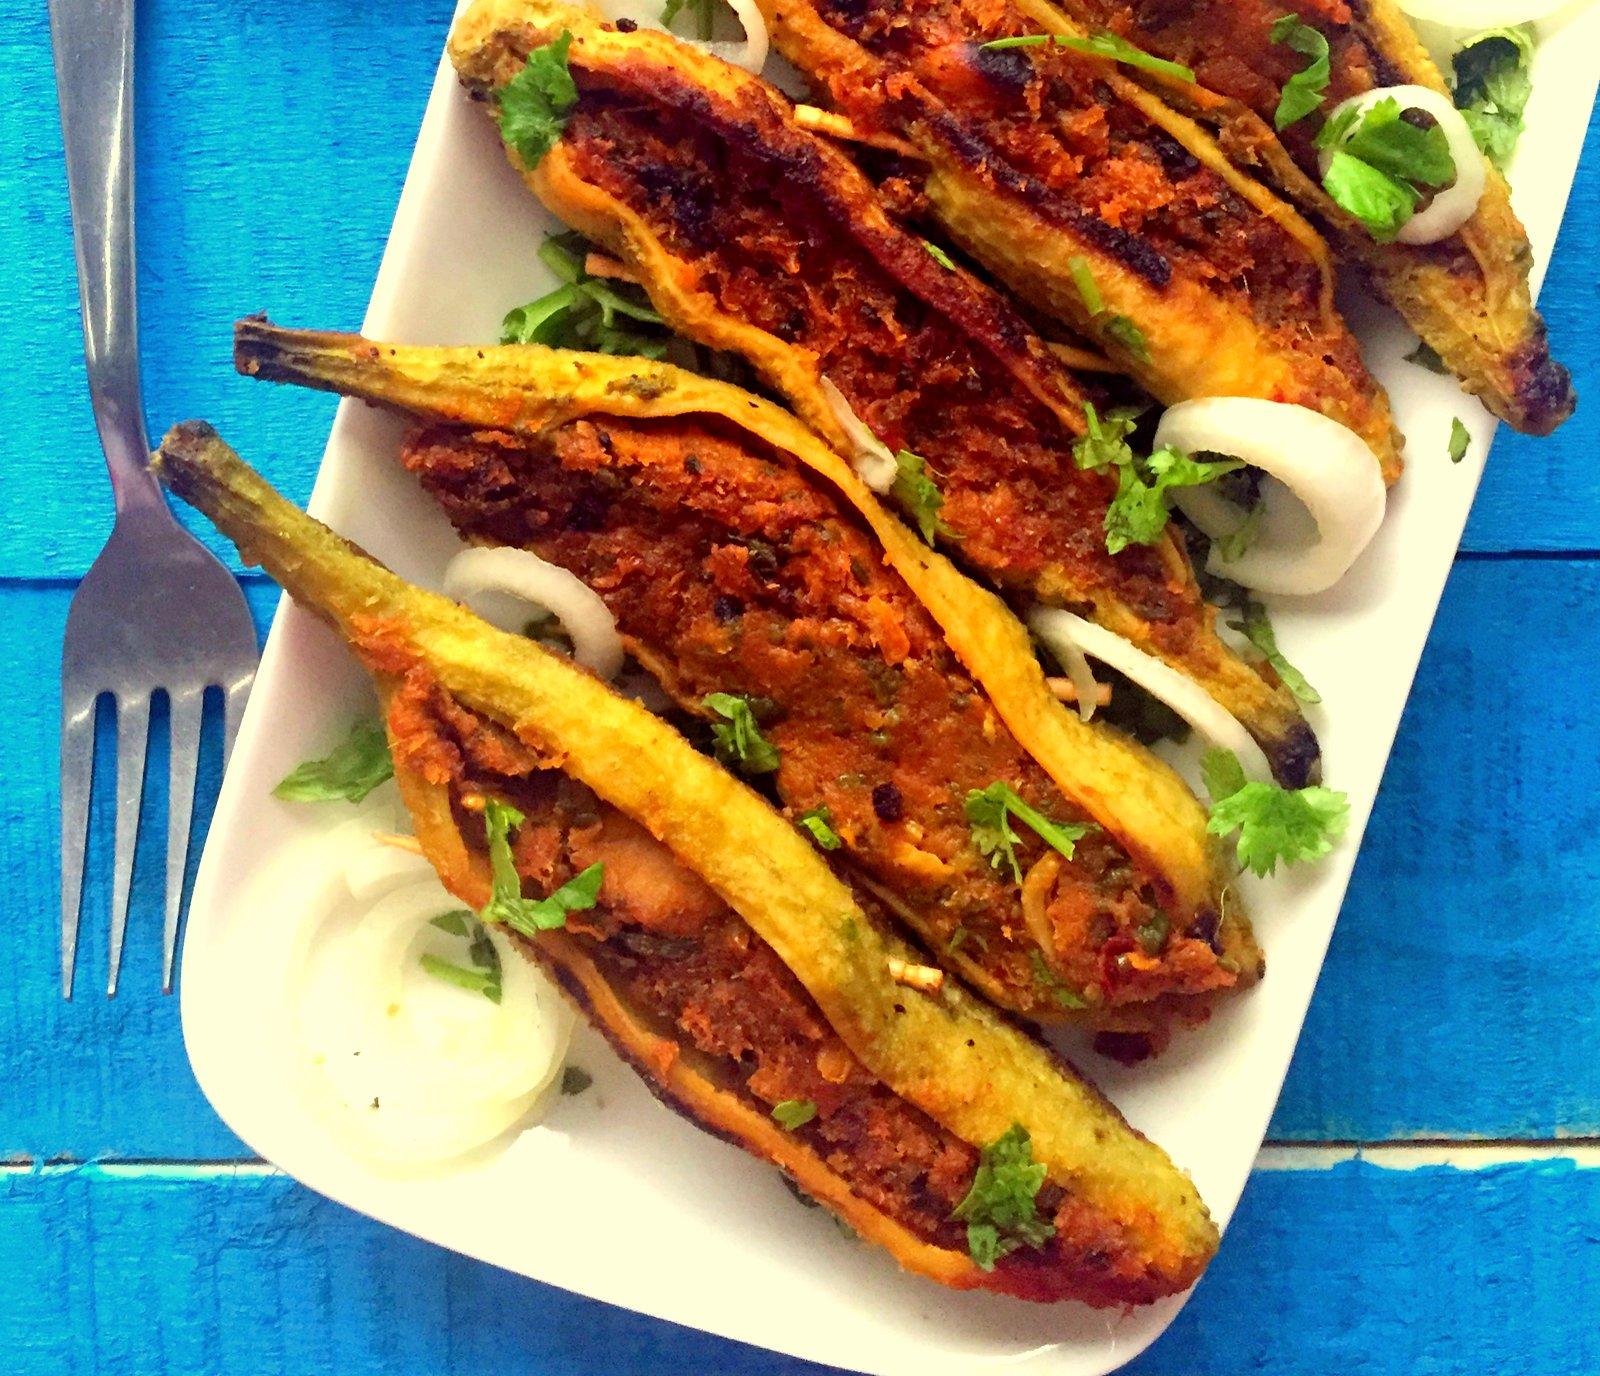 bharwa karela recipe in hindi by archanas bharwa karela recipe in hindi forumfinder Images